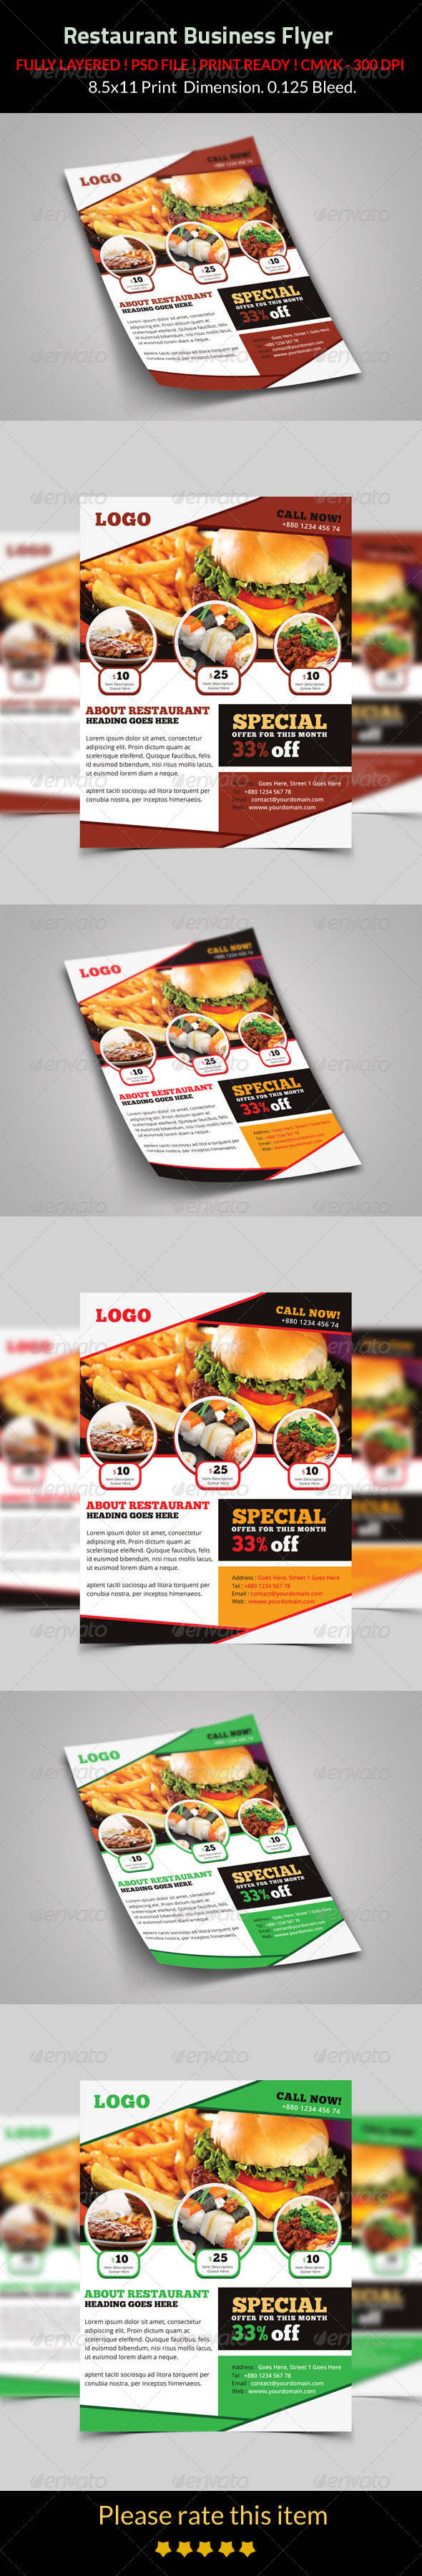 GraphicRiver Restaurant Business Flyer 8195022